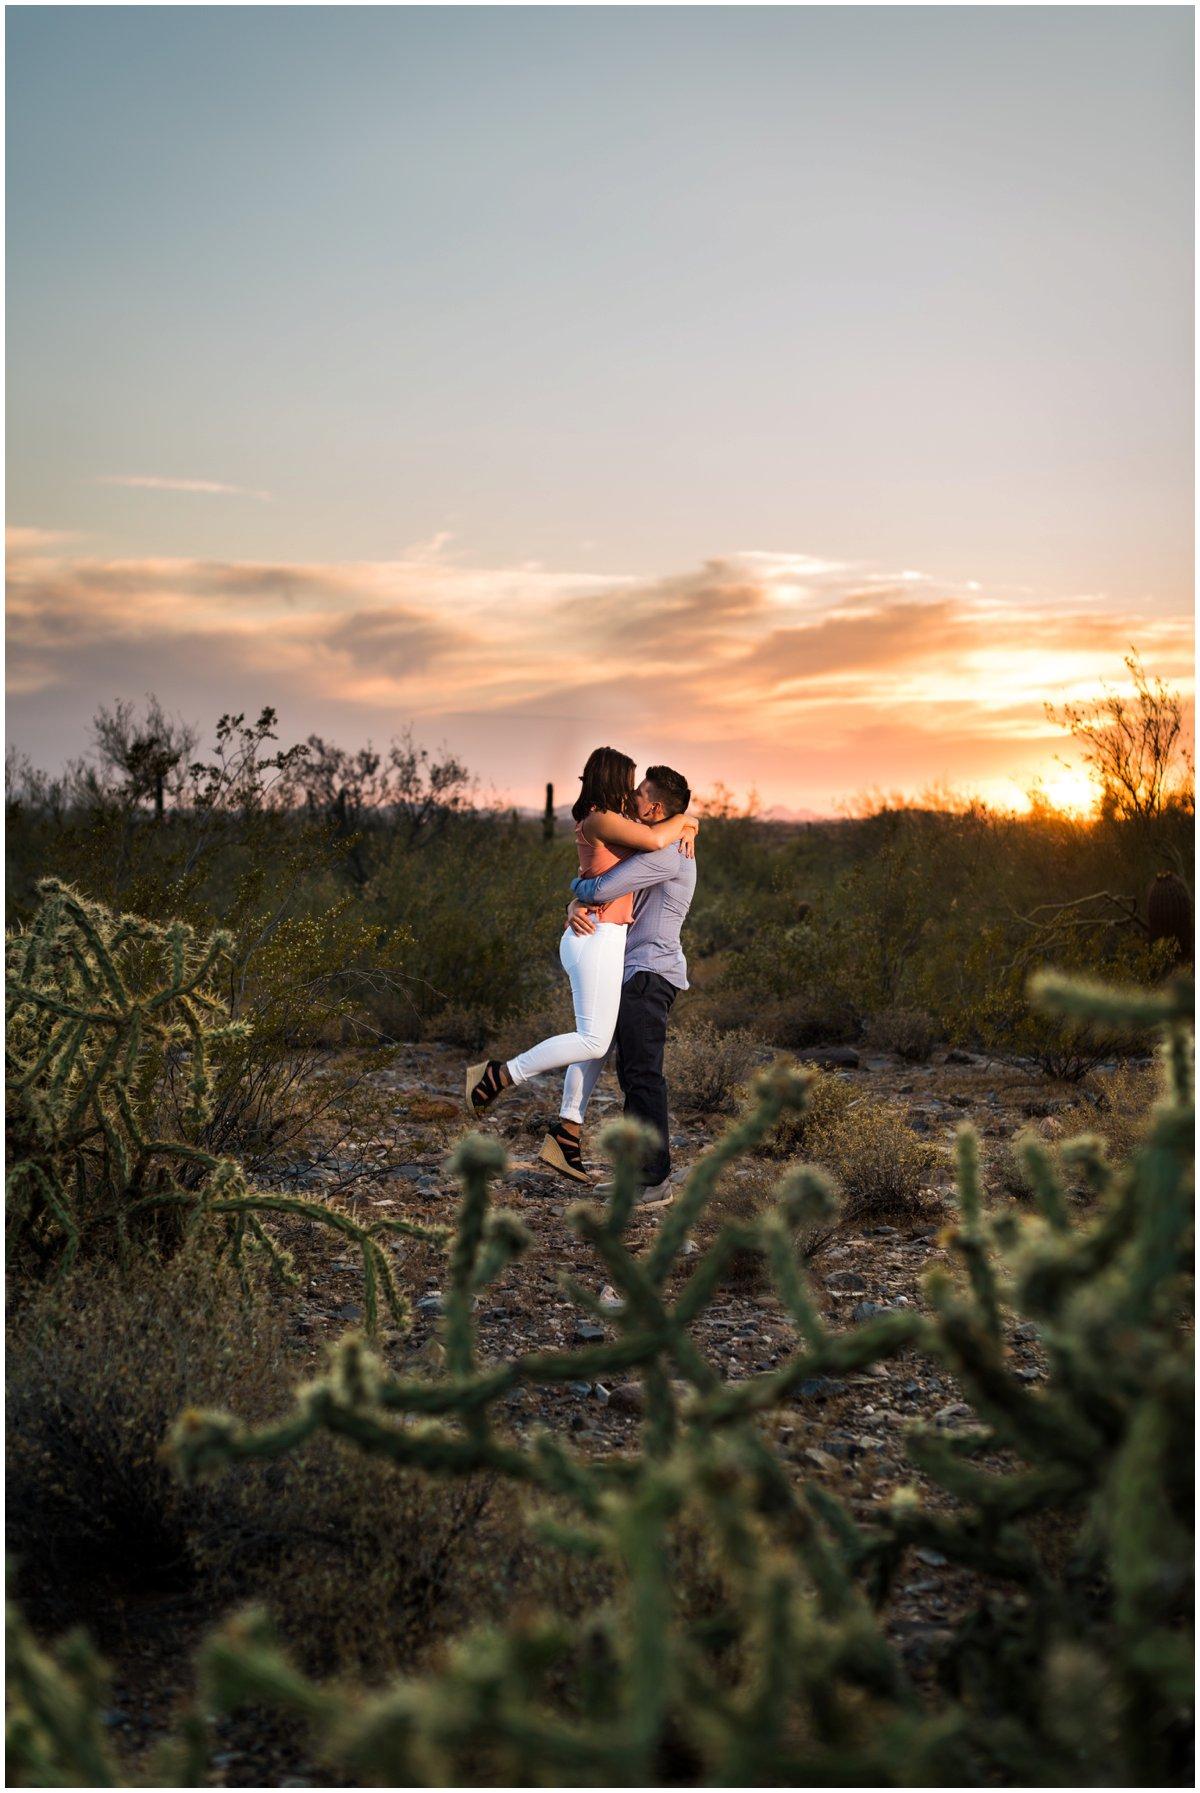 Desert Mountain Engagement Photos at McDowell Mountain in Scottsdale, Arizona